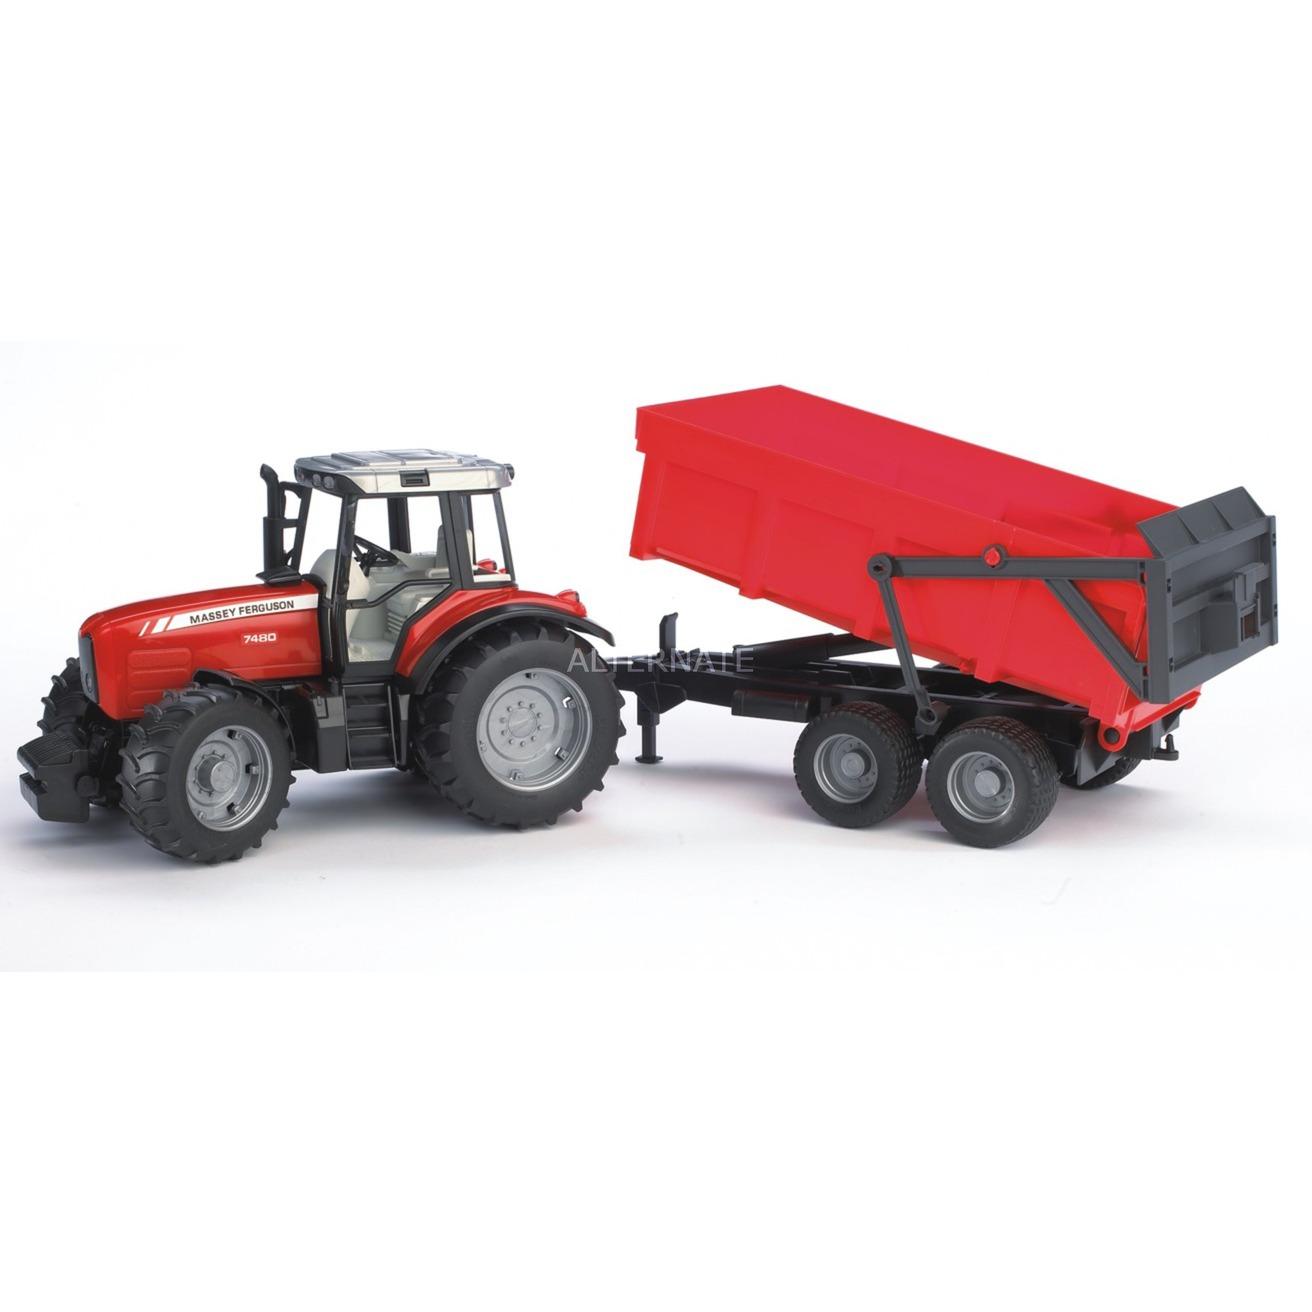 02045 modelo de vehículo de tierra Previamente montado Modelo a escala de tractor 1:16, Automóvil de construcción